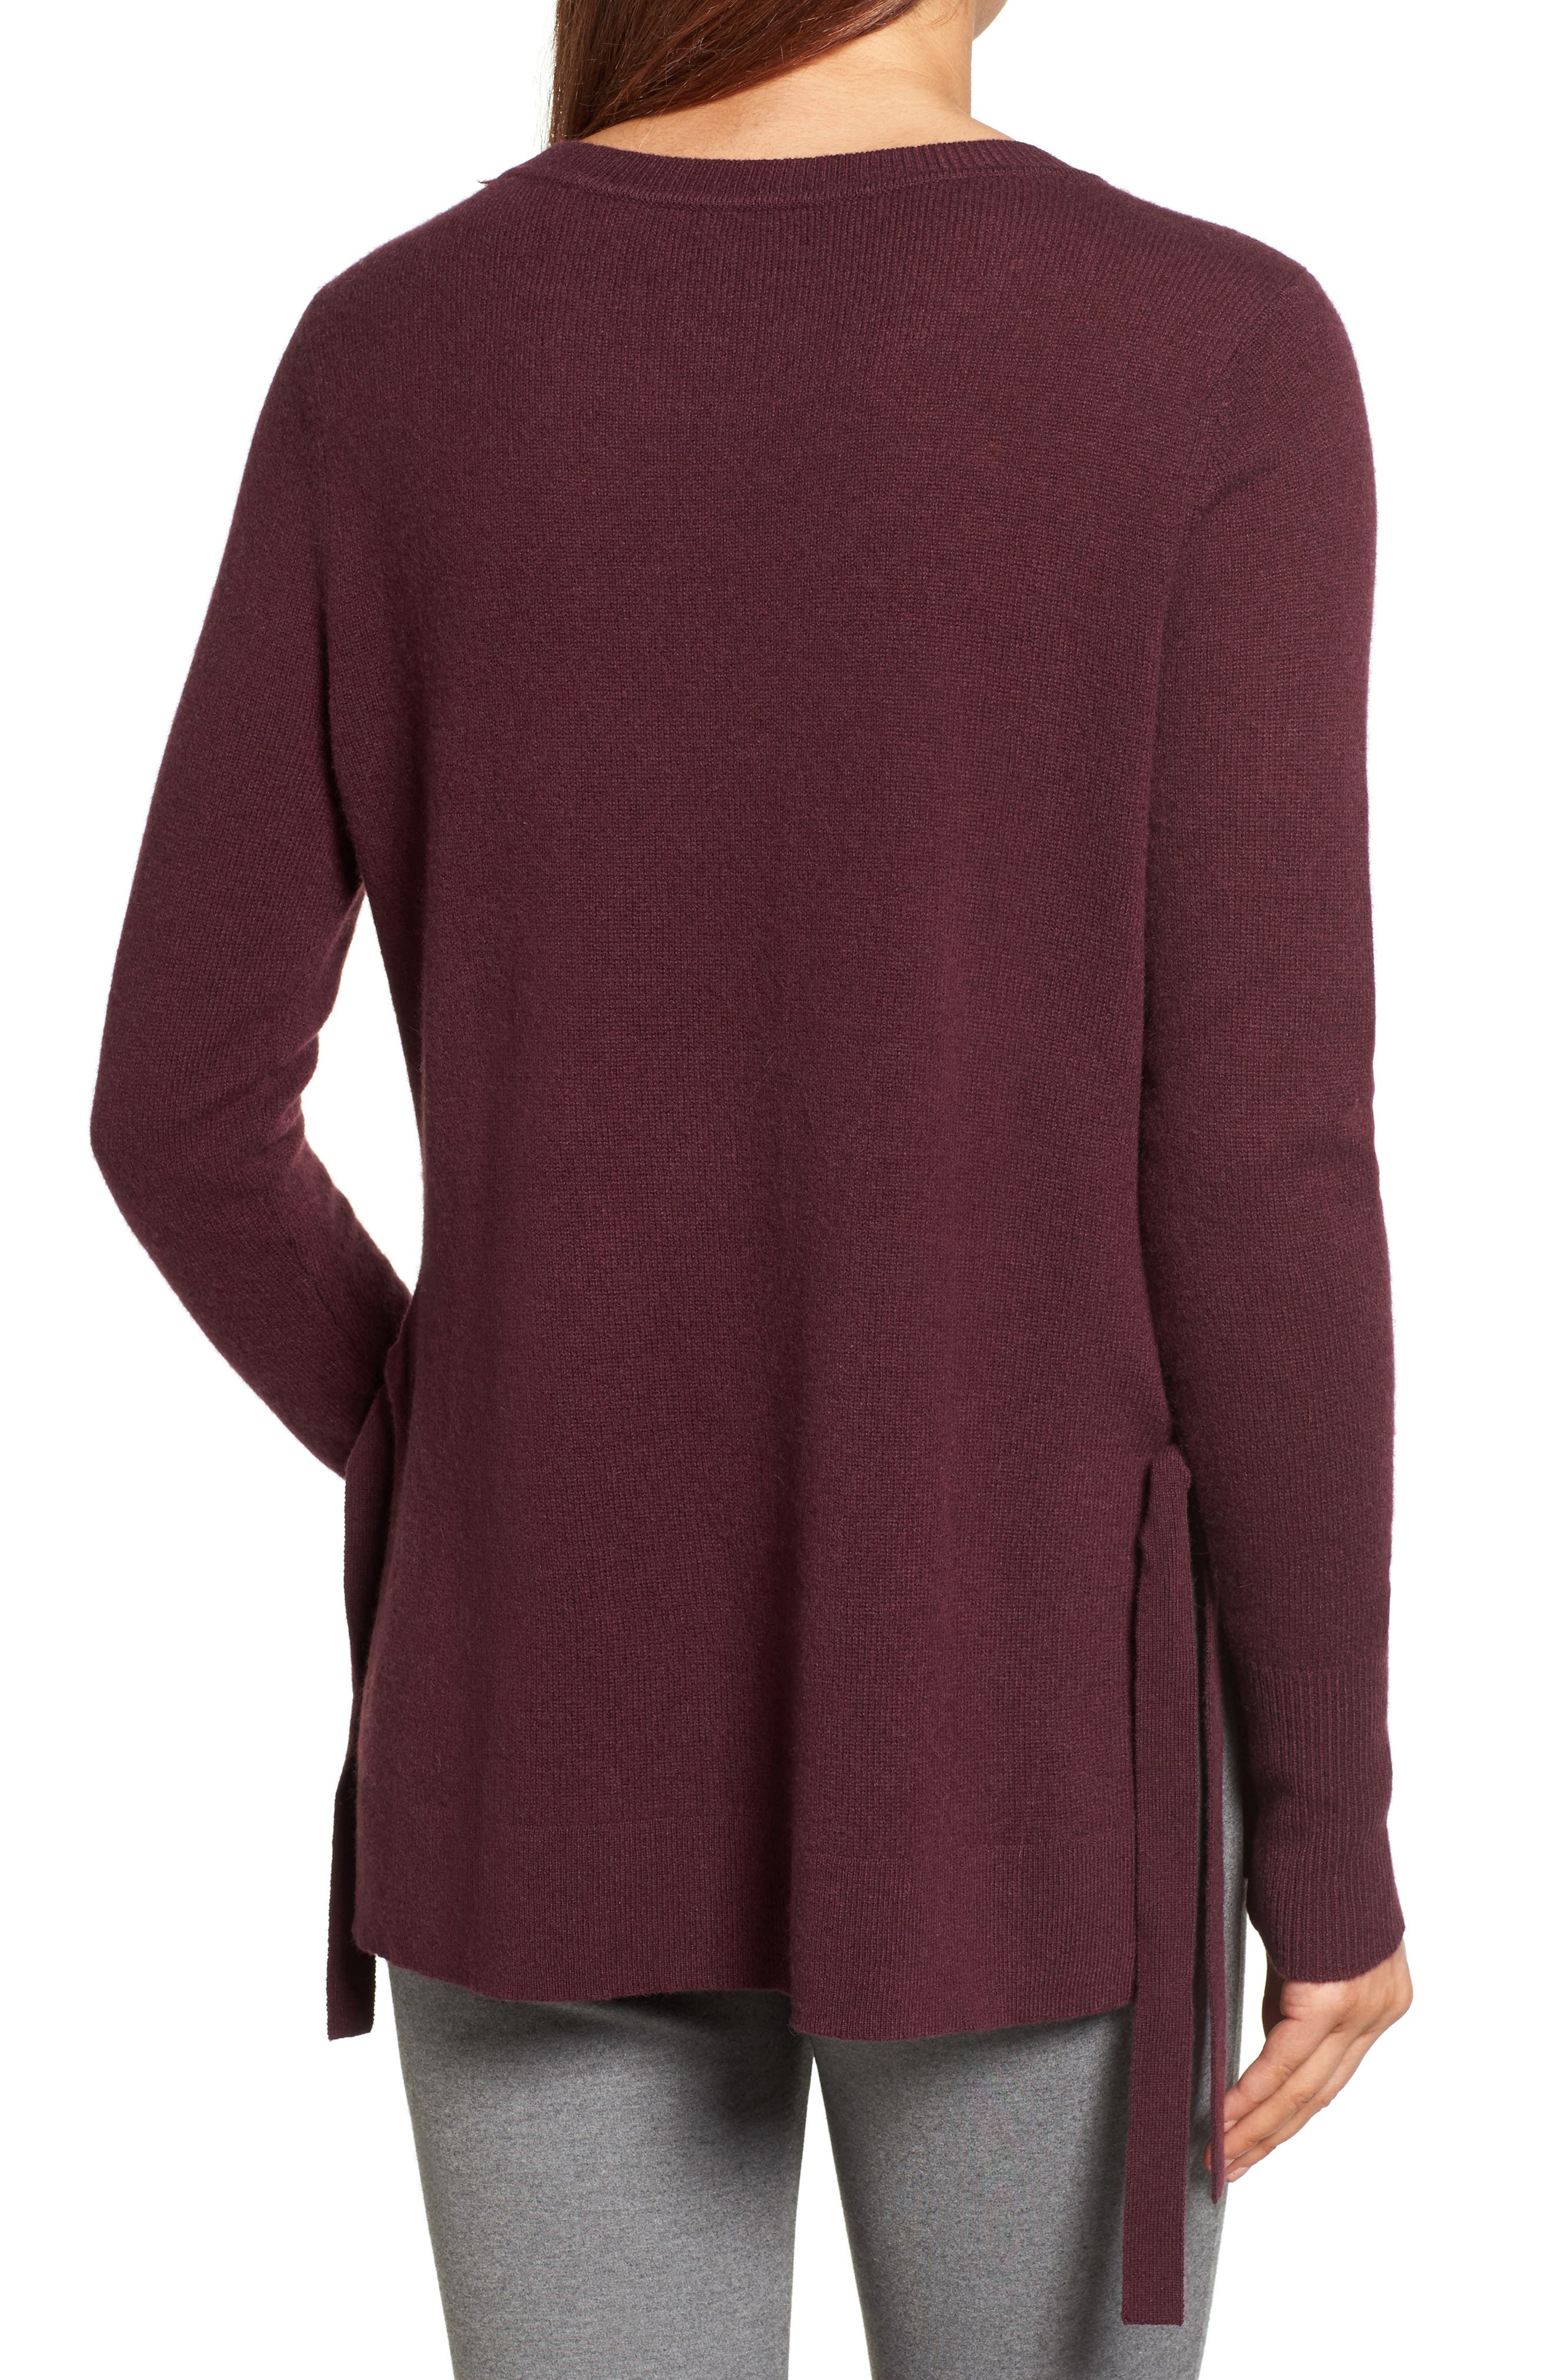 Alternate Image 2  - Halogen® Side Tie Cashmere Sweater (Regular & Petite)